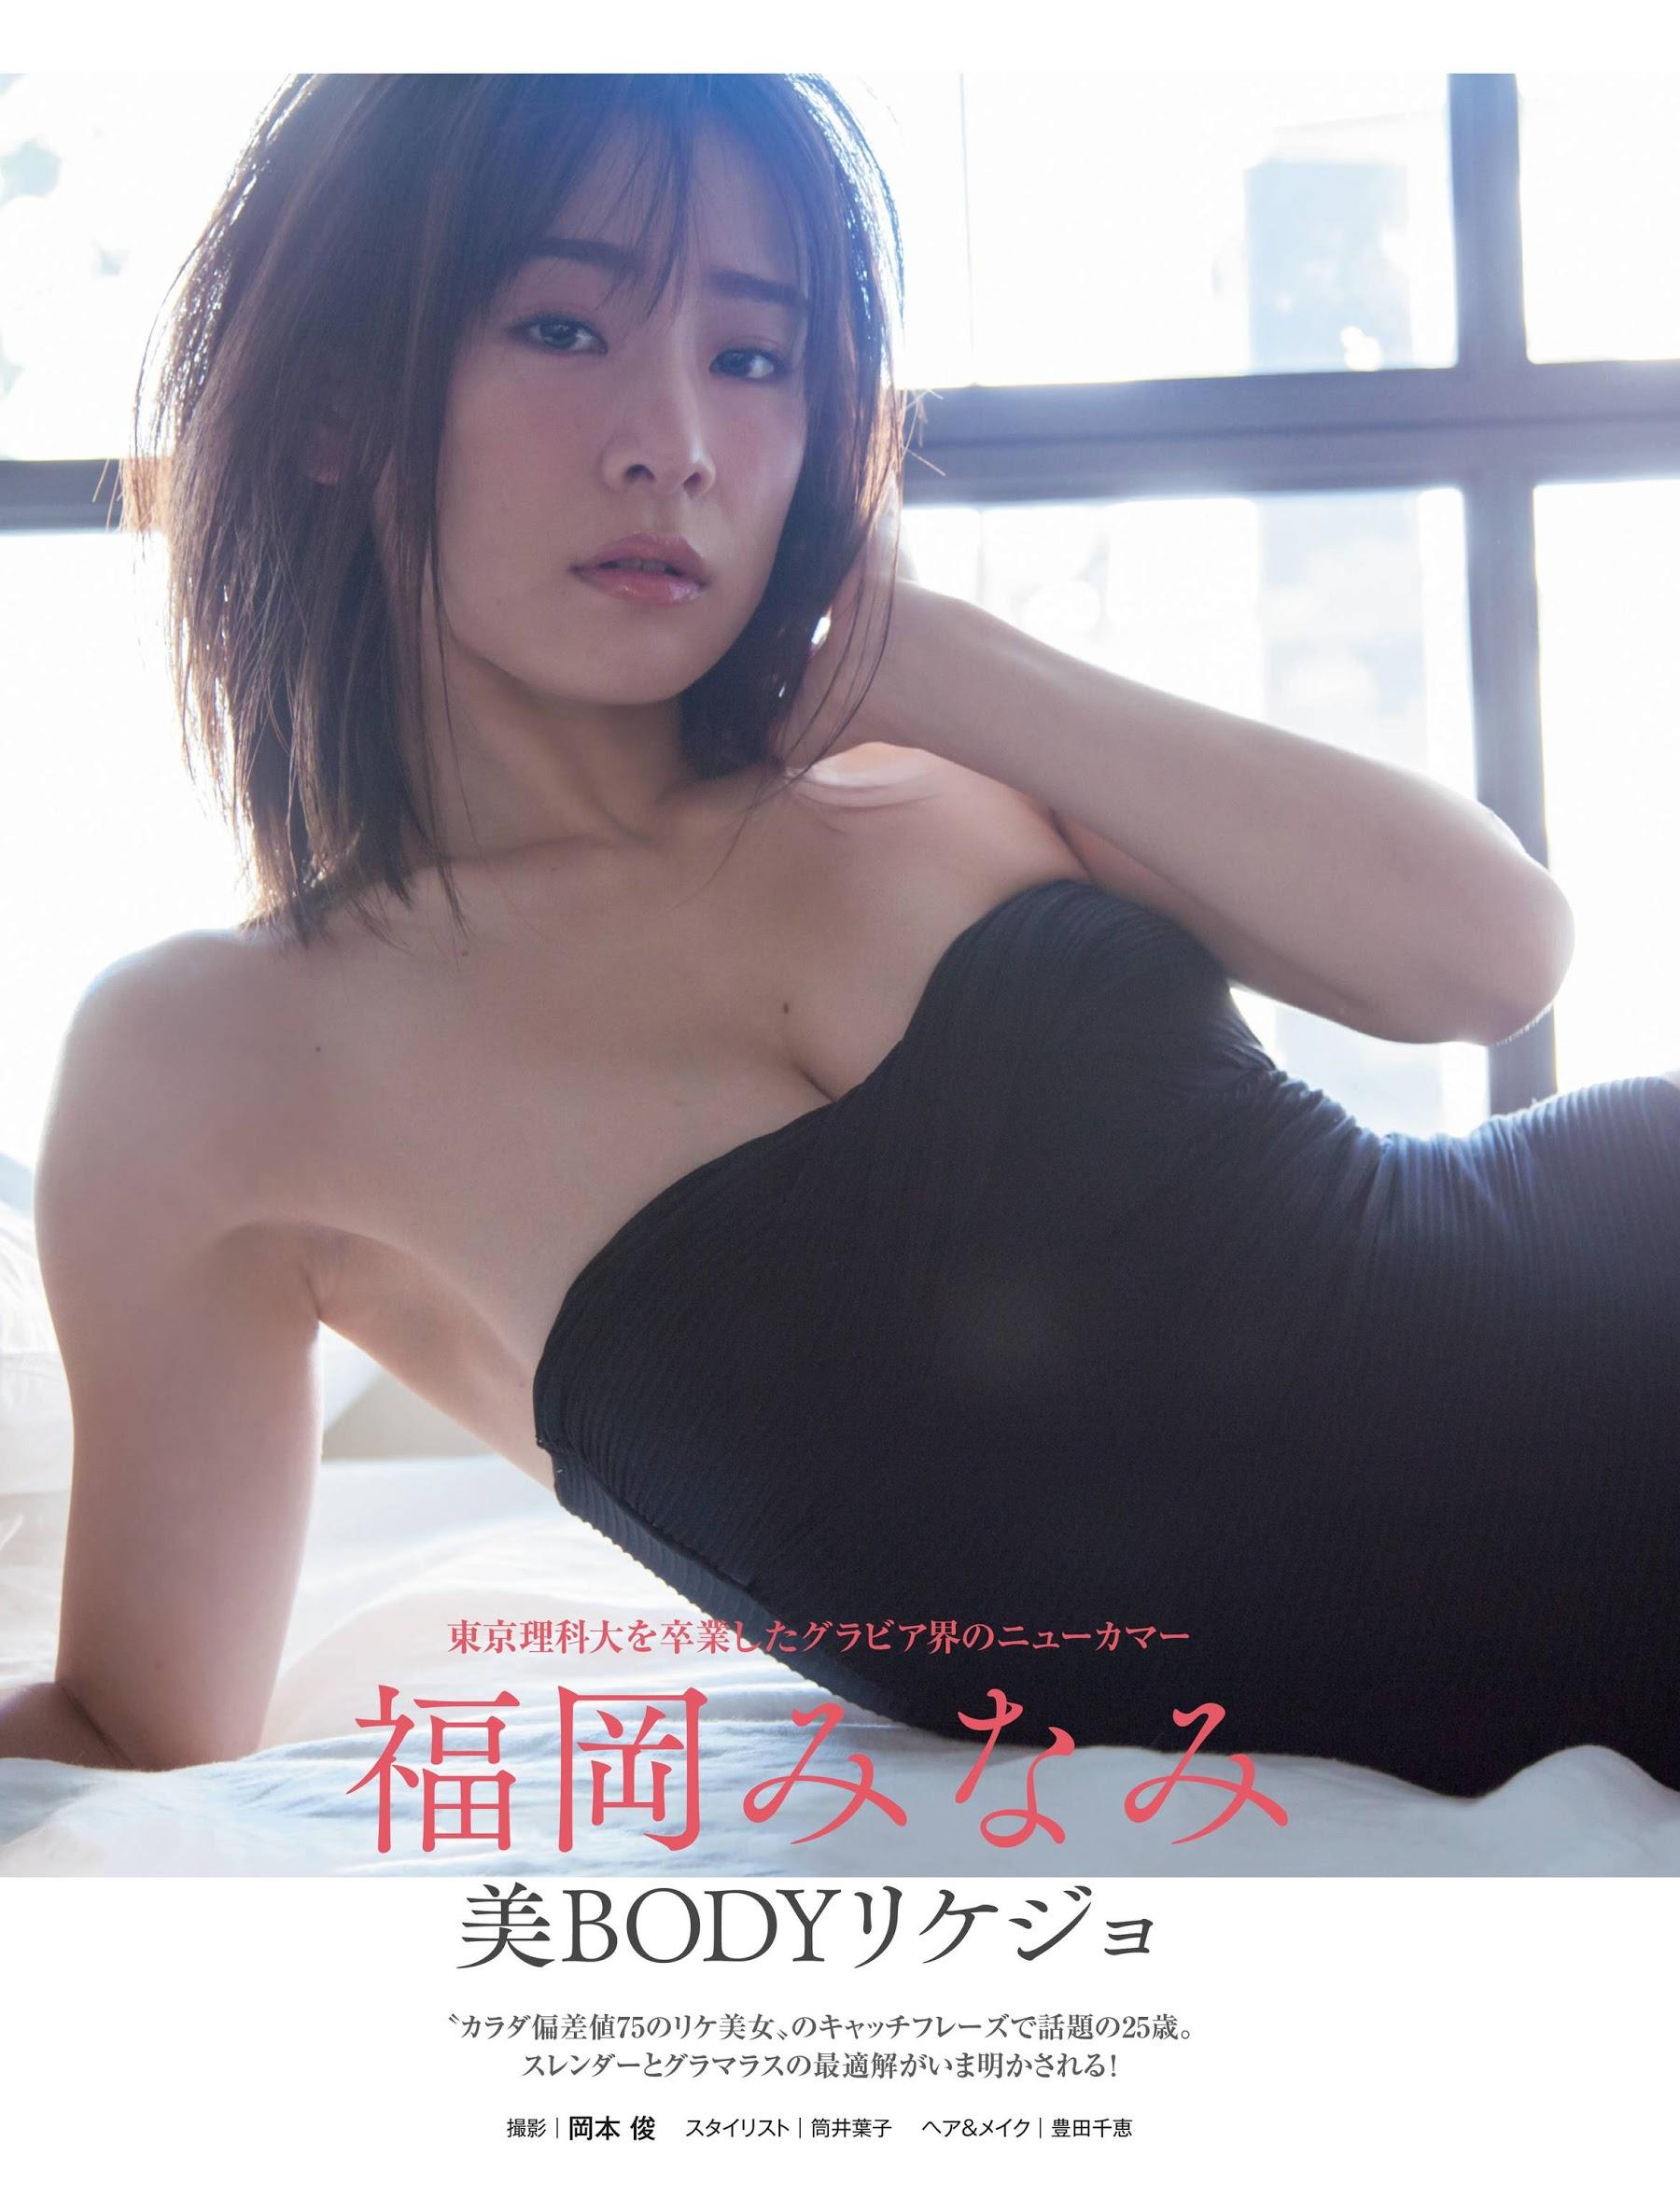 Newcomer in the gravure world who graduated from Tokyo University of Science Minami Fukuoka Swimsuit gravure bikini beauty BODY Rikejo 2020001